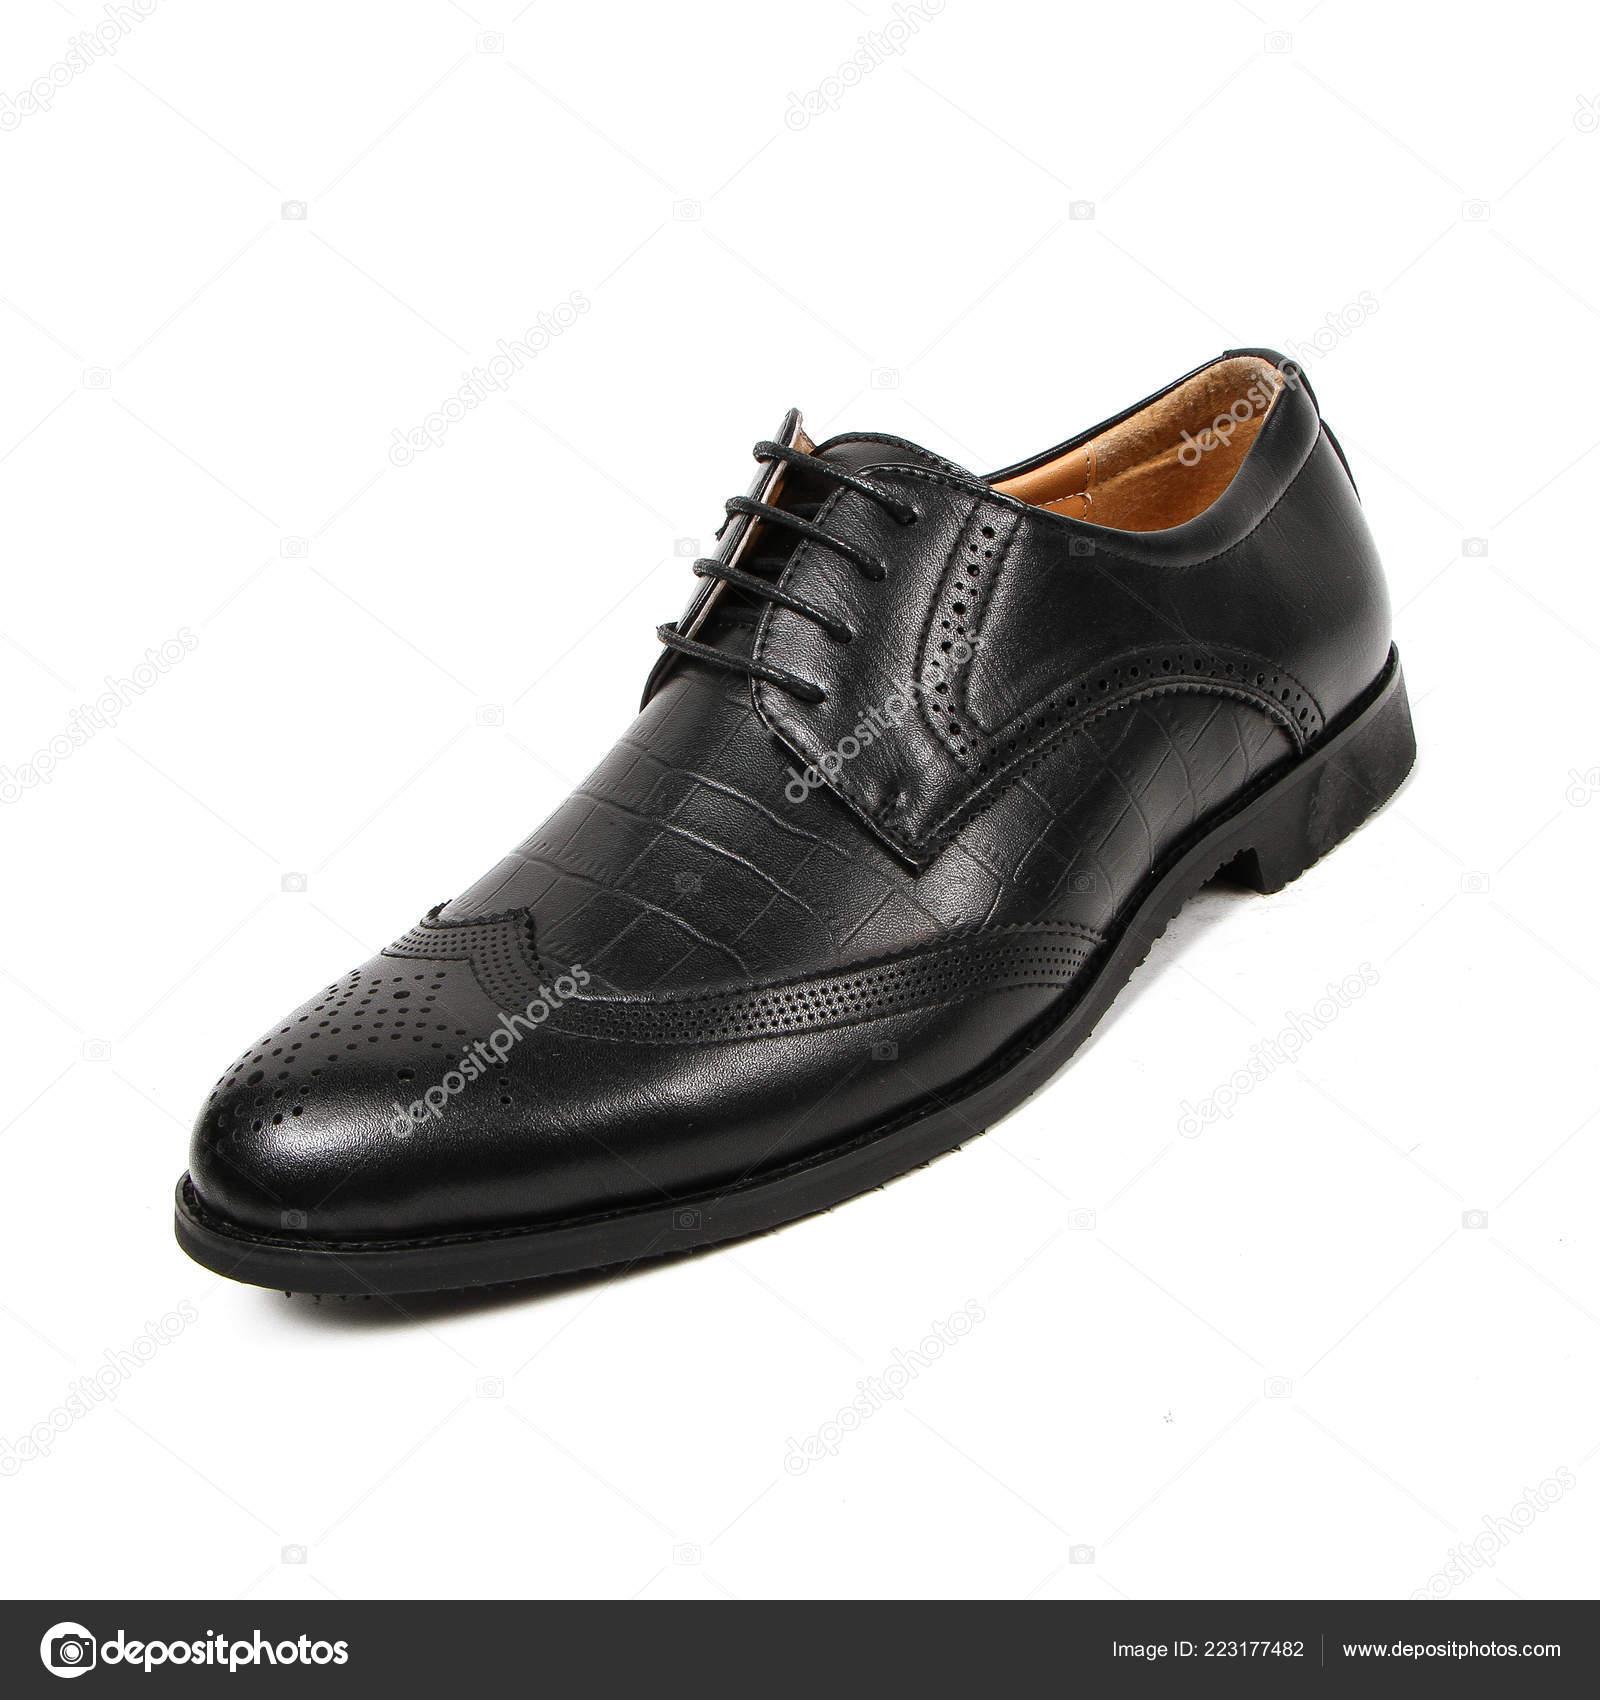 81b021a2cd3 Cueros de oficina hombre zapatos aislados en blanco– imagen de stock